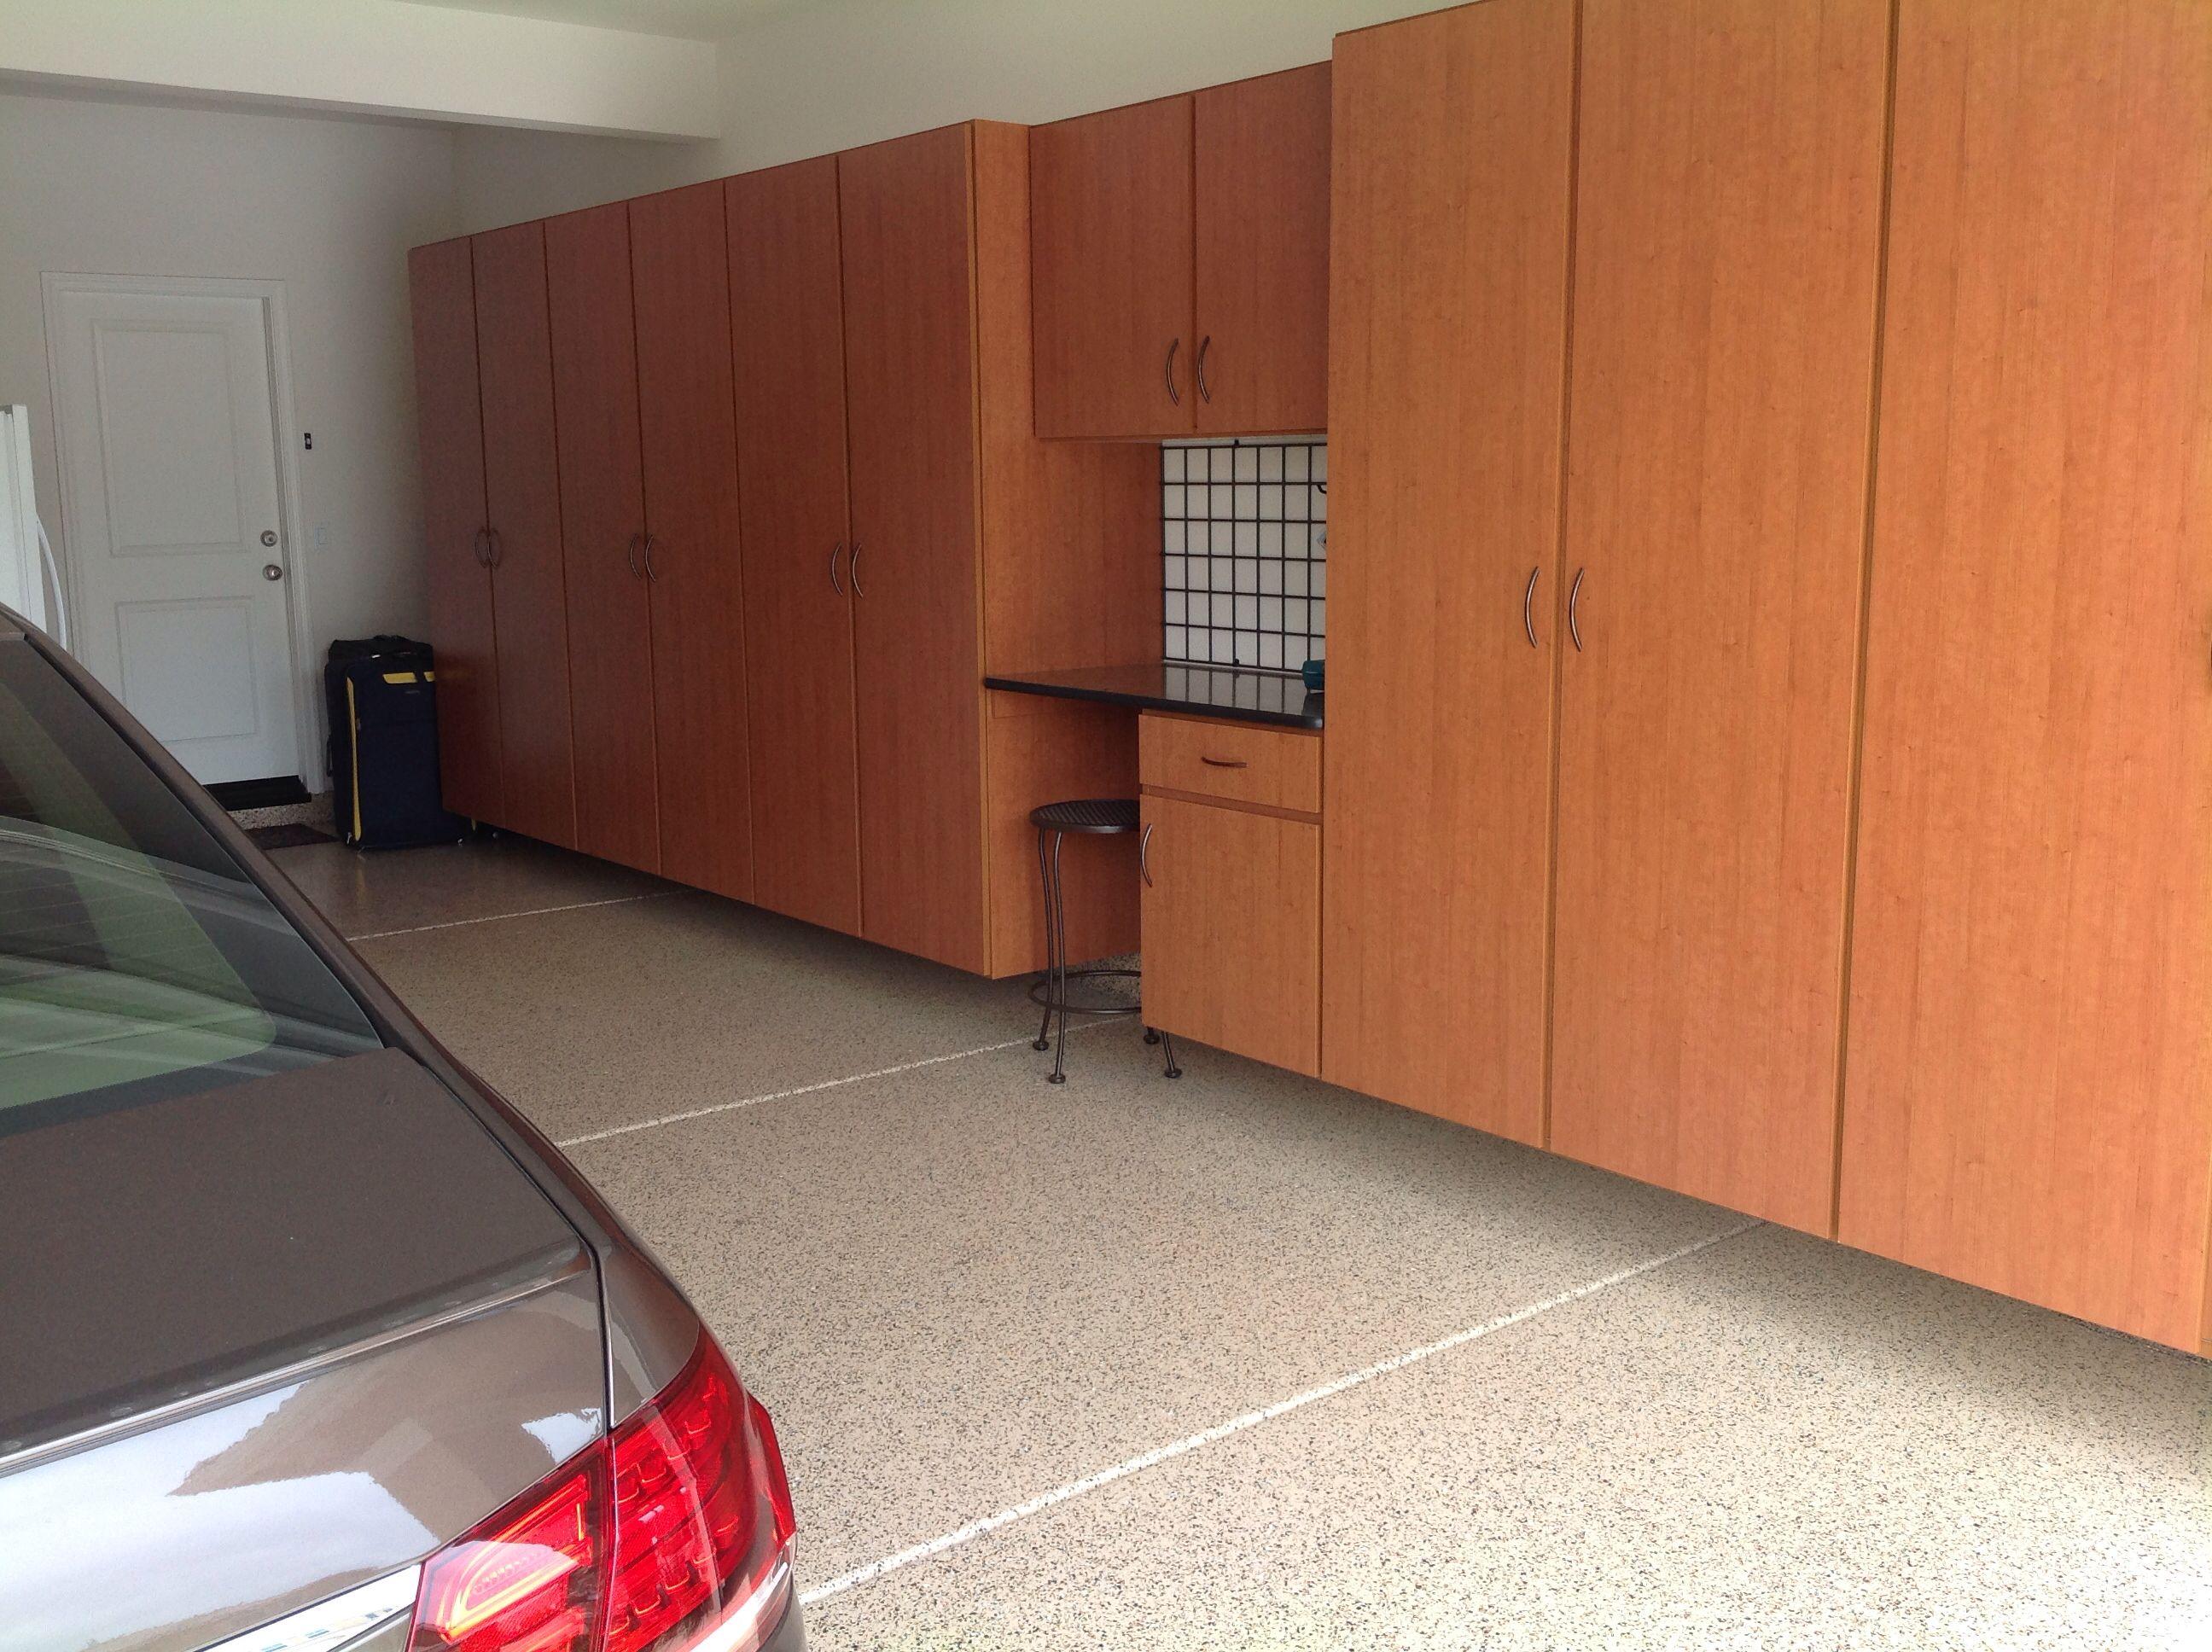 Garage Storage Cabinets Temecula www.trcgarage.com ...